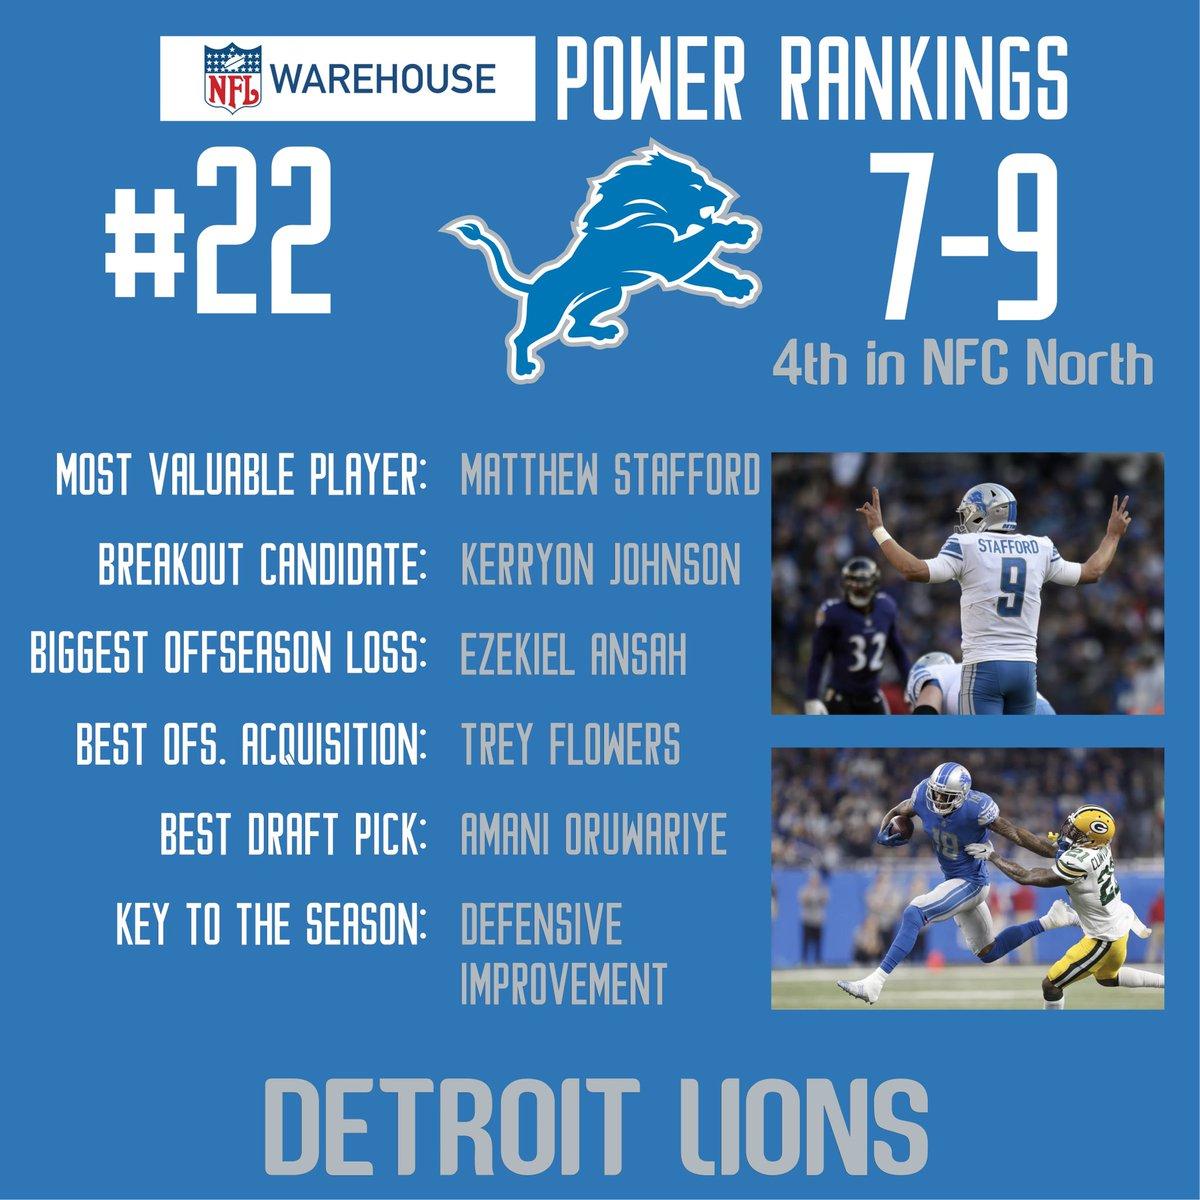 #22 in the NFL Warehouse 2019 Preseason Power Rankings are the Detroit #Lions   #NFL #DetroitLions #NFLWarehouse https://t.co/MXRpNeouS7